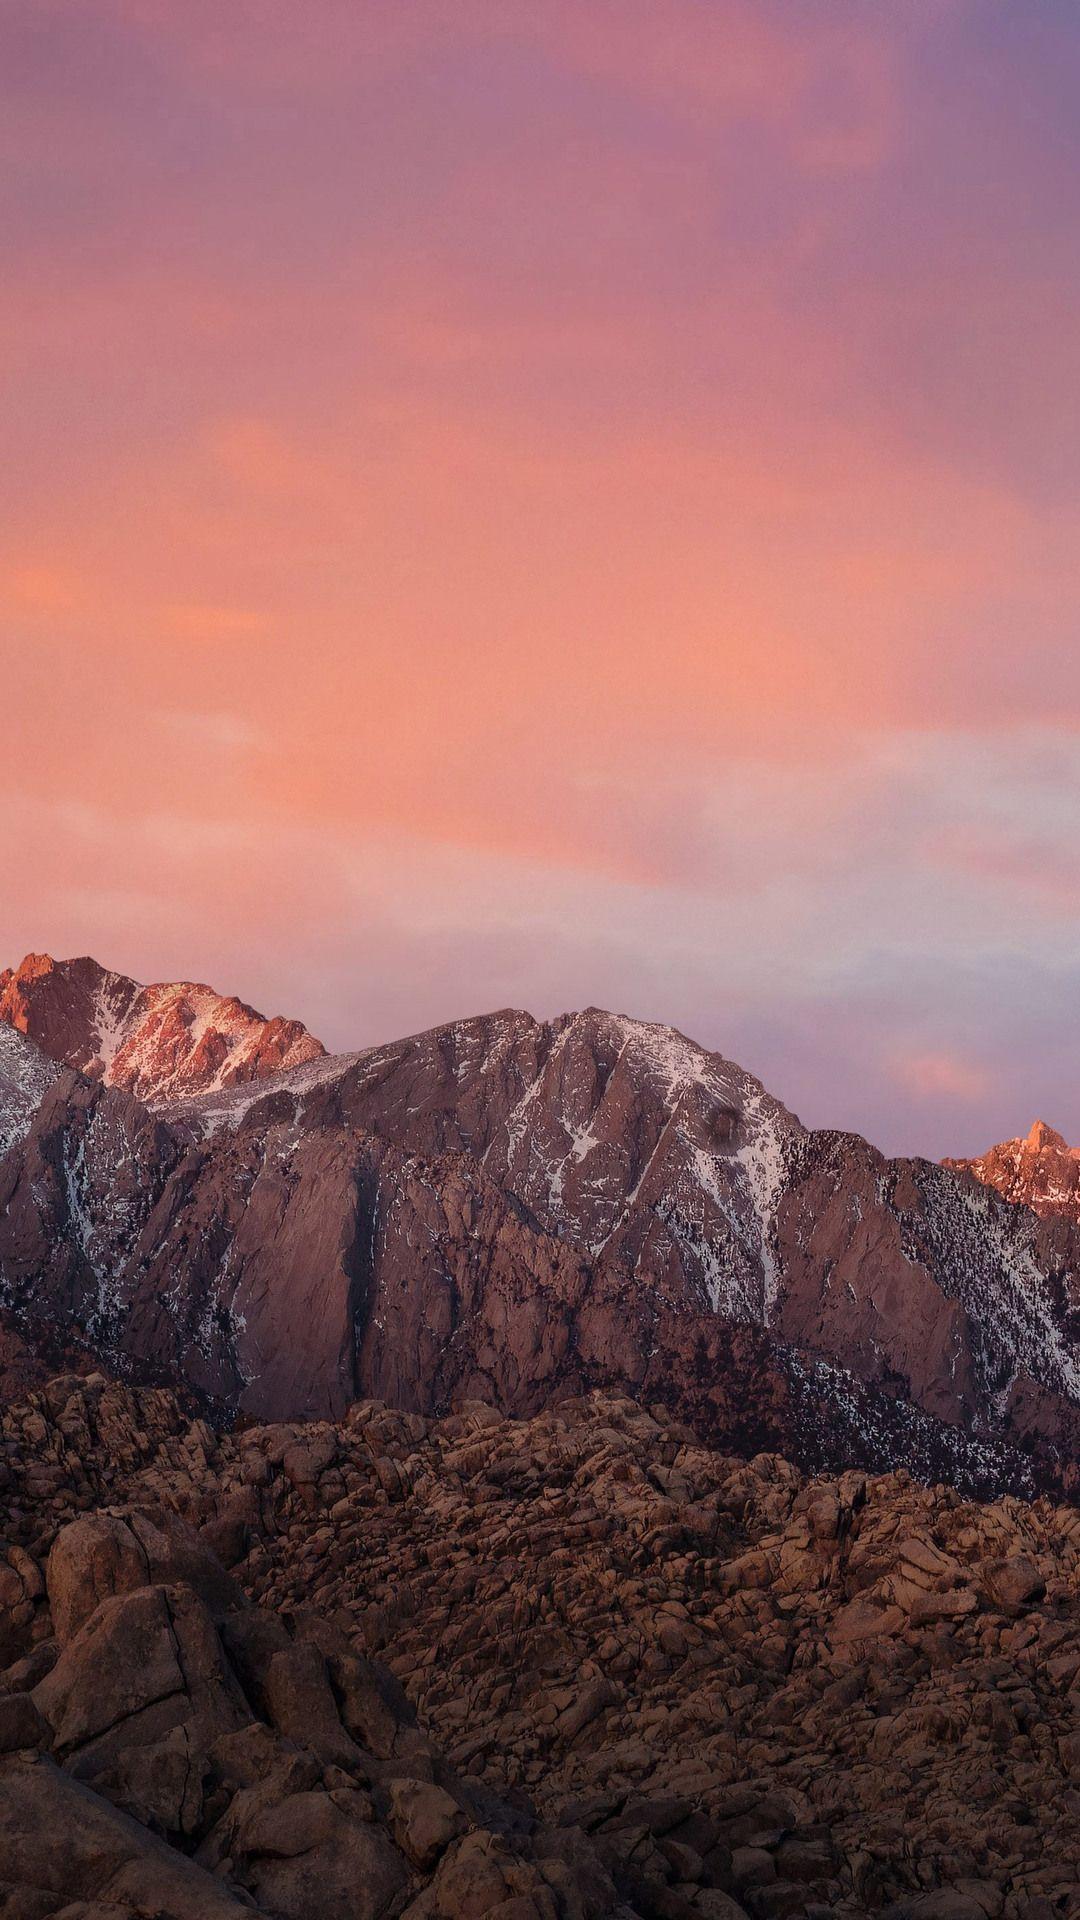 Download Mac Os Sierra Wallpaper Hd Backgrounds Download